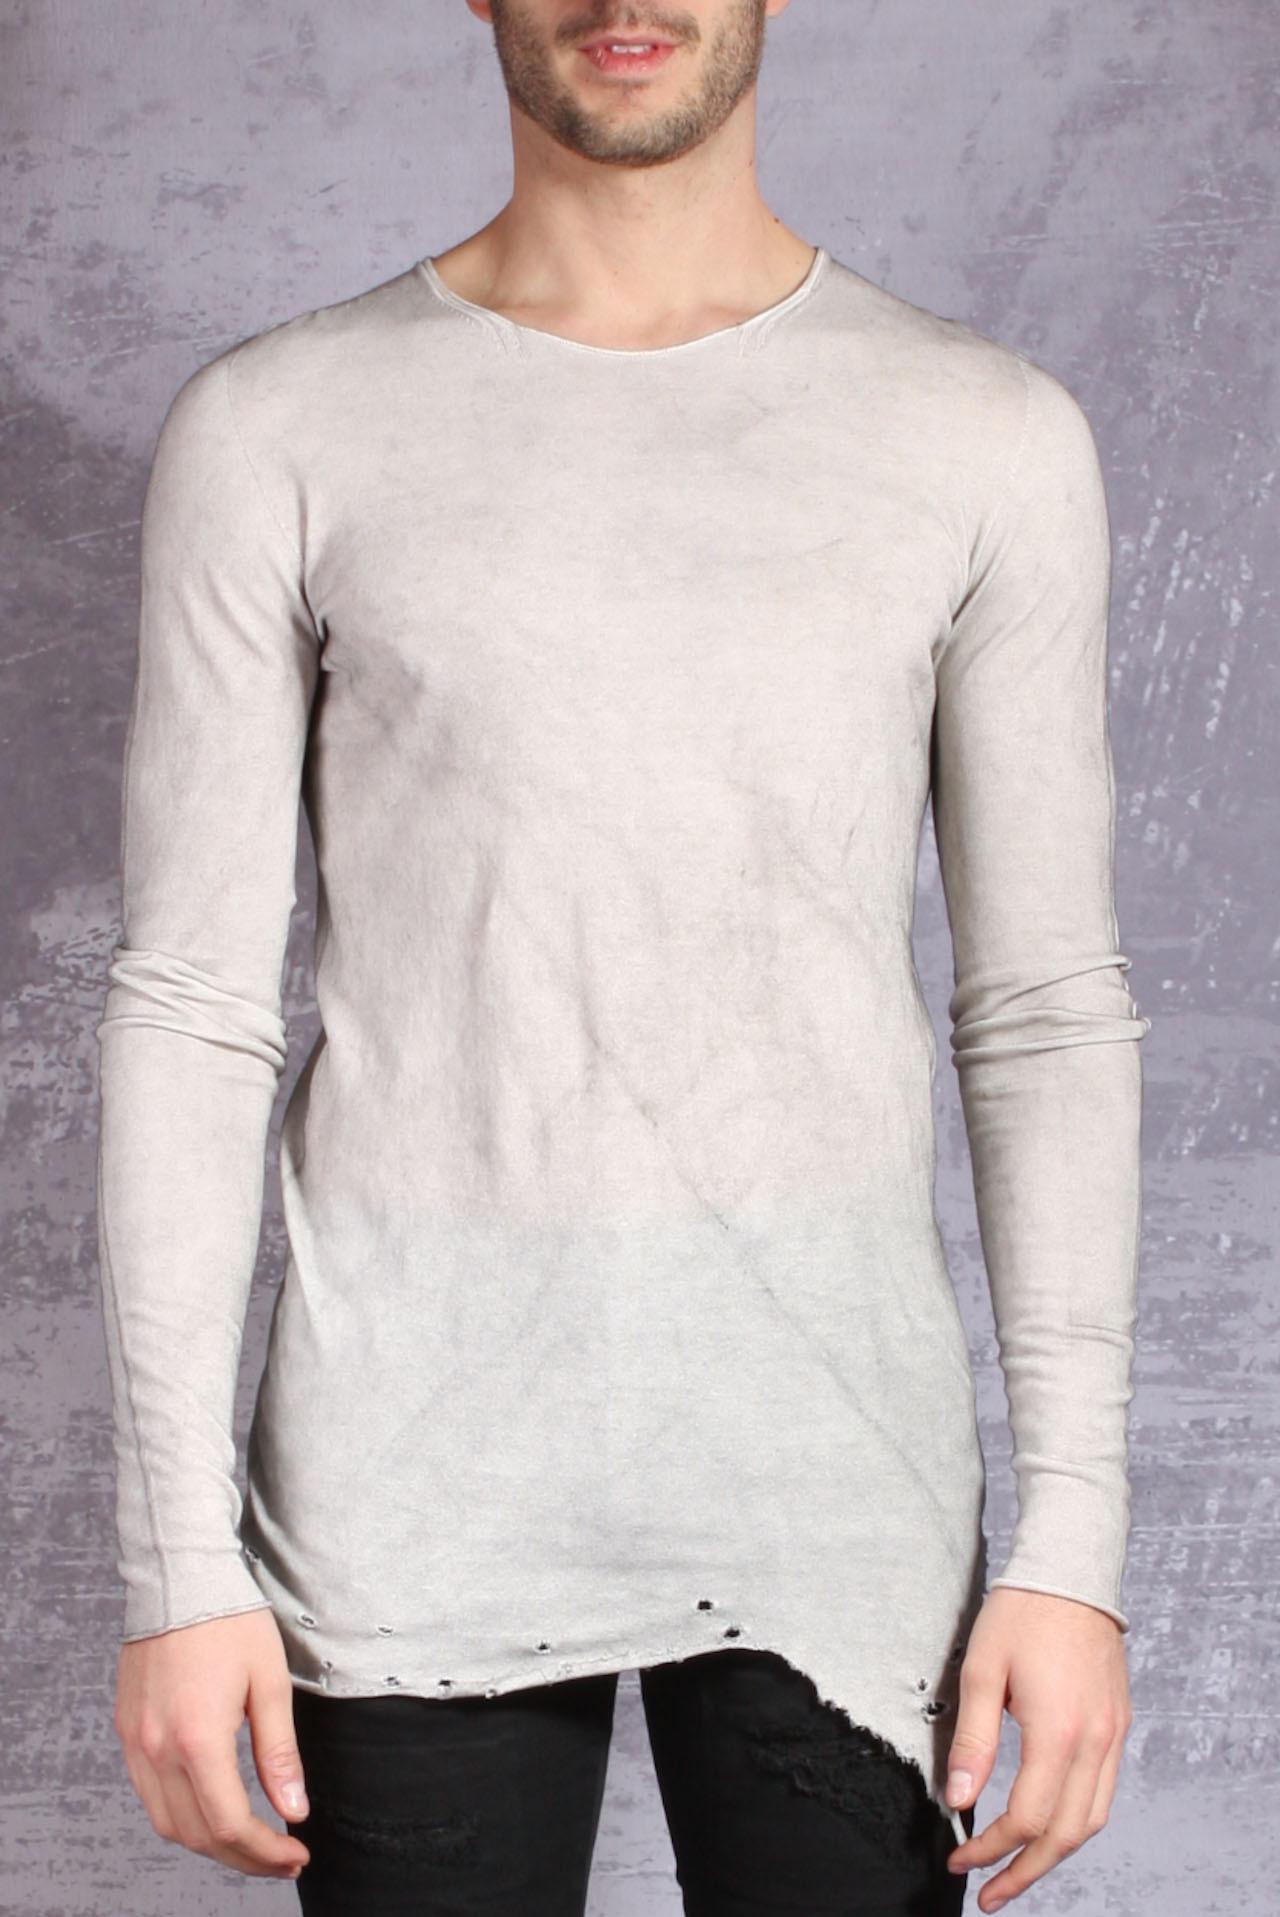 MD75 sweater